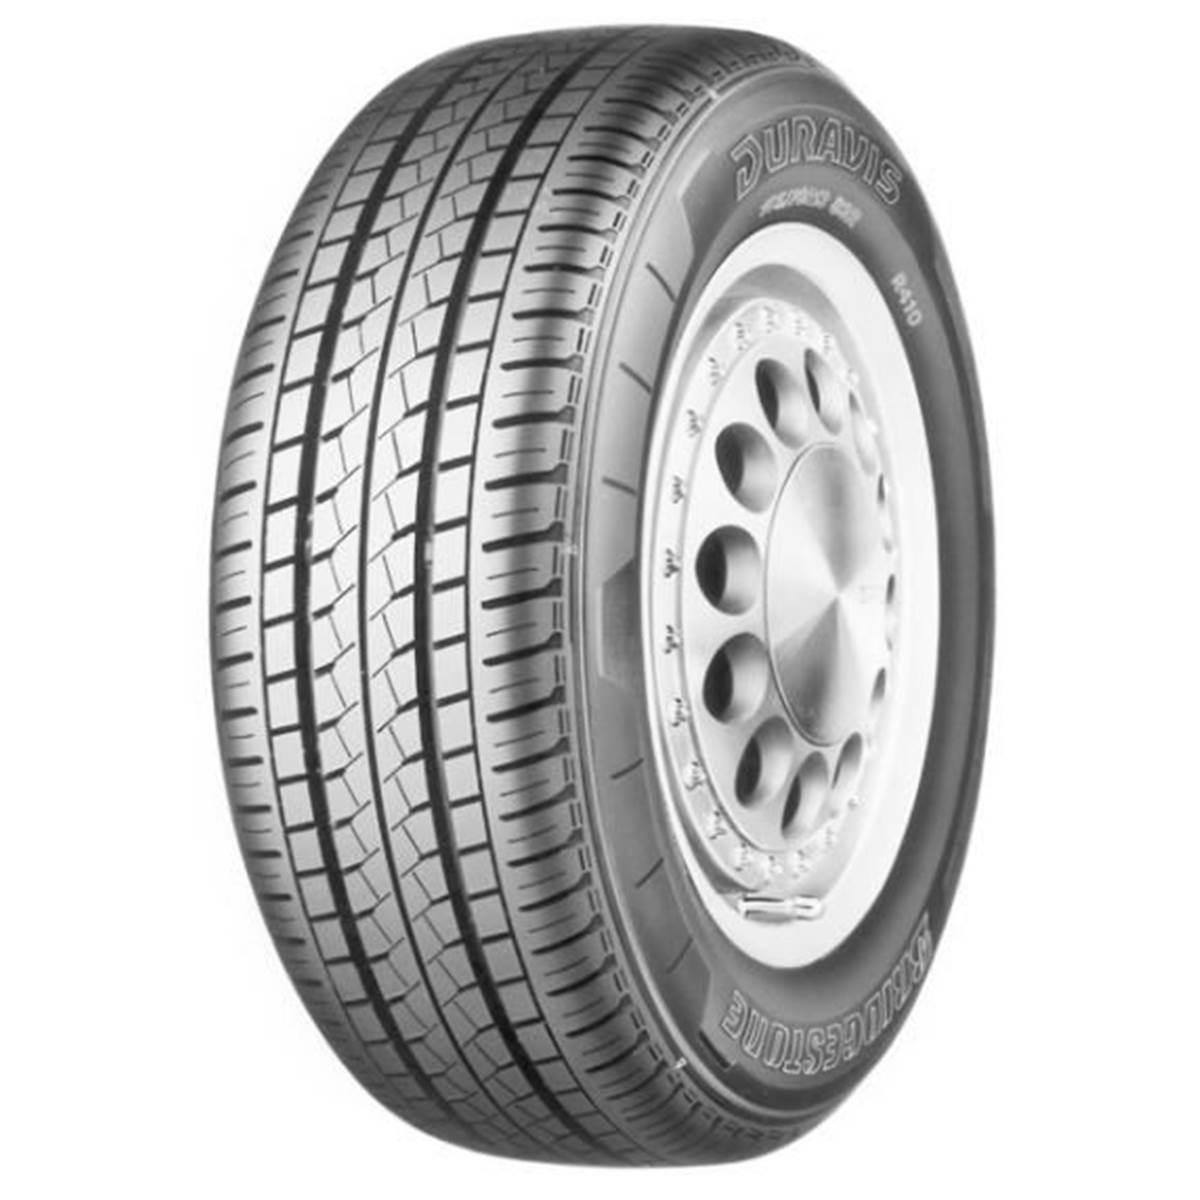 Pneu Bridgestone 185/65R15 92T Duravis R410